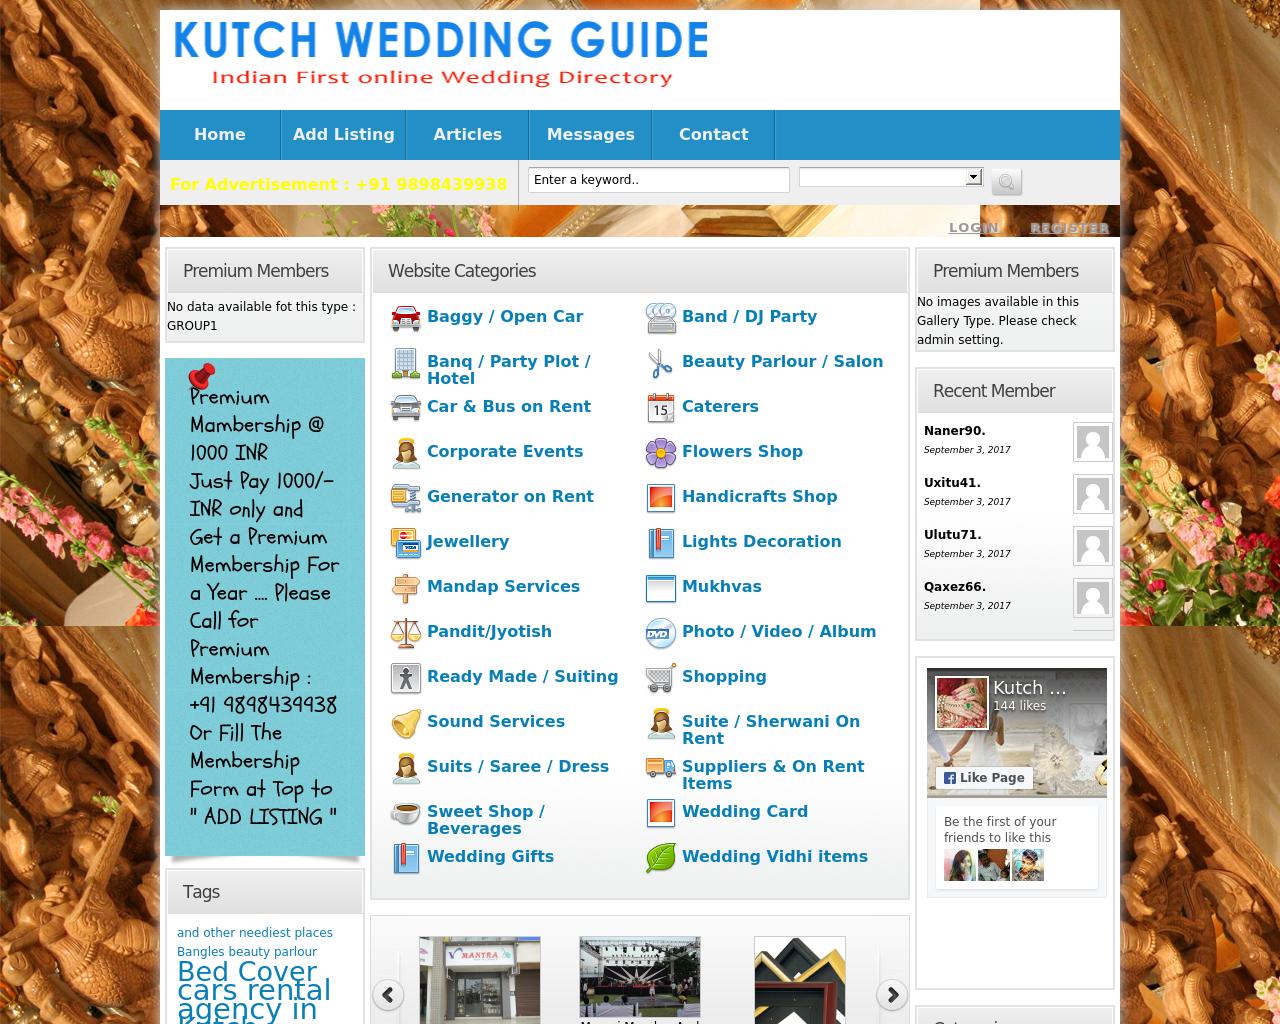 Kutch-Wedding-Guide-Advertising-Reviews-Pricing